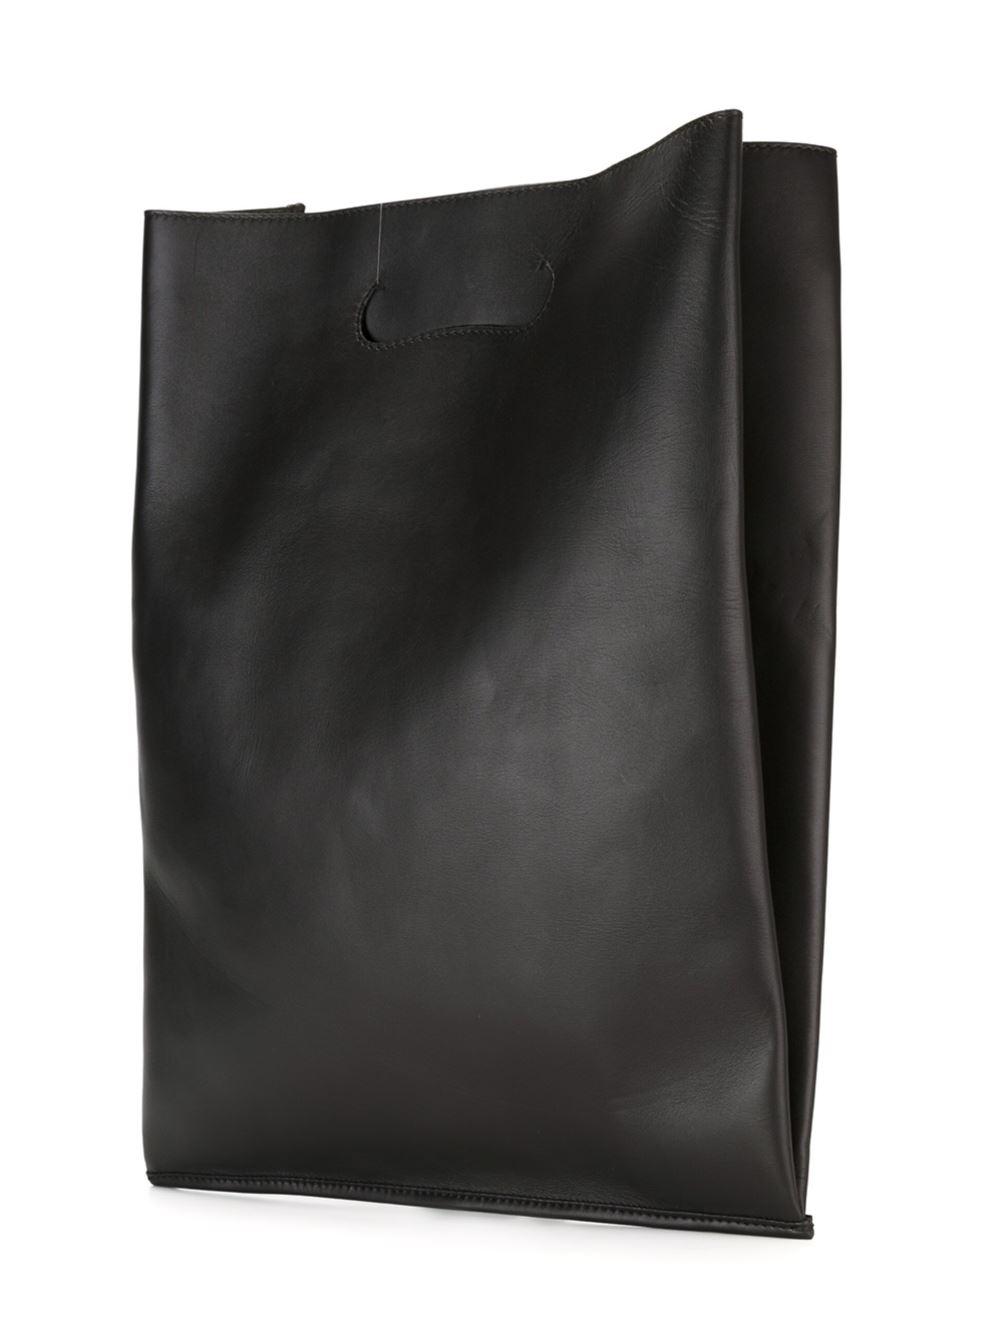 Maison Margiela Leather Large Slim Tote in Black